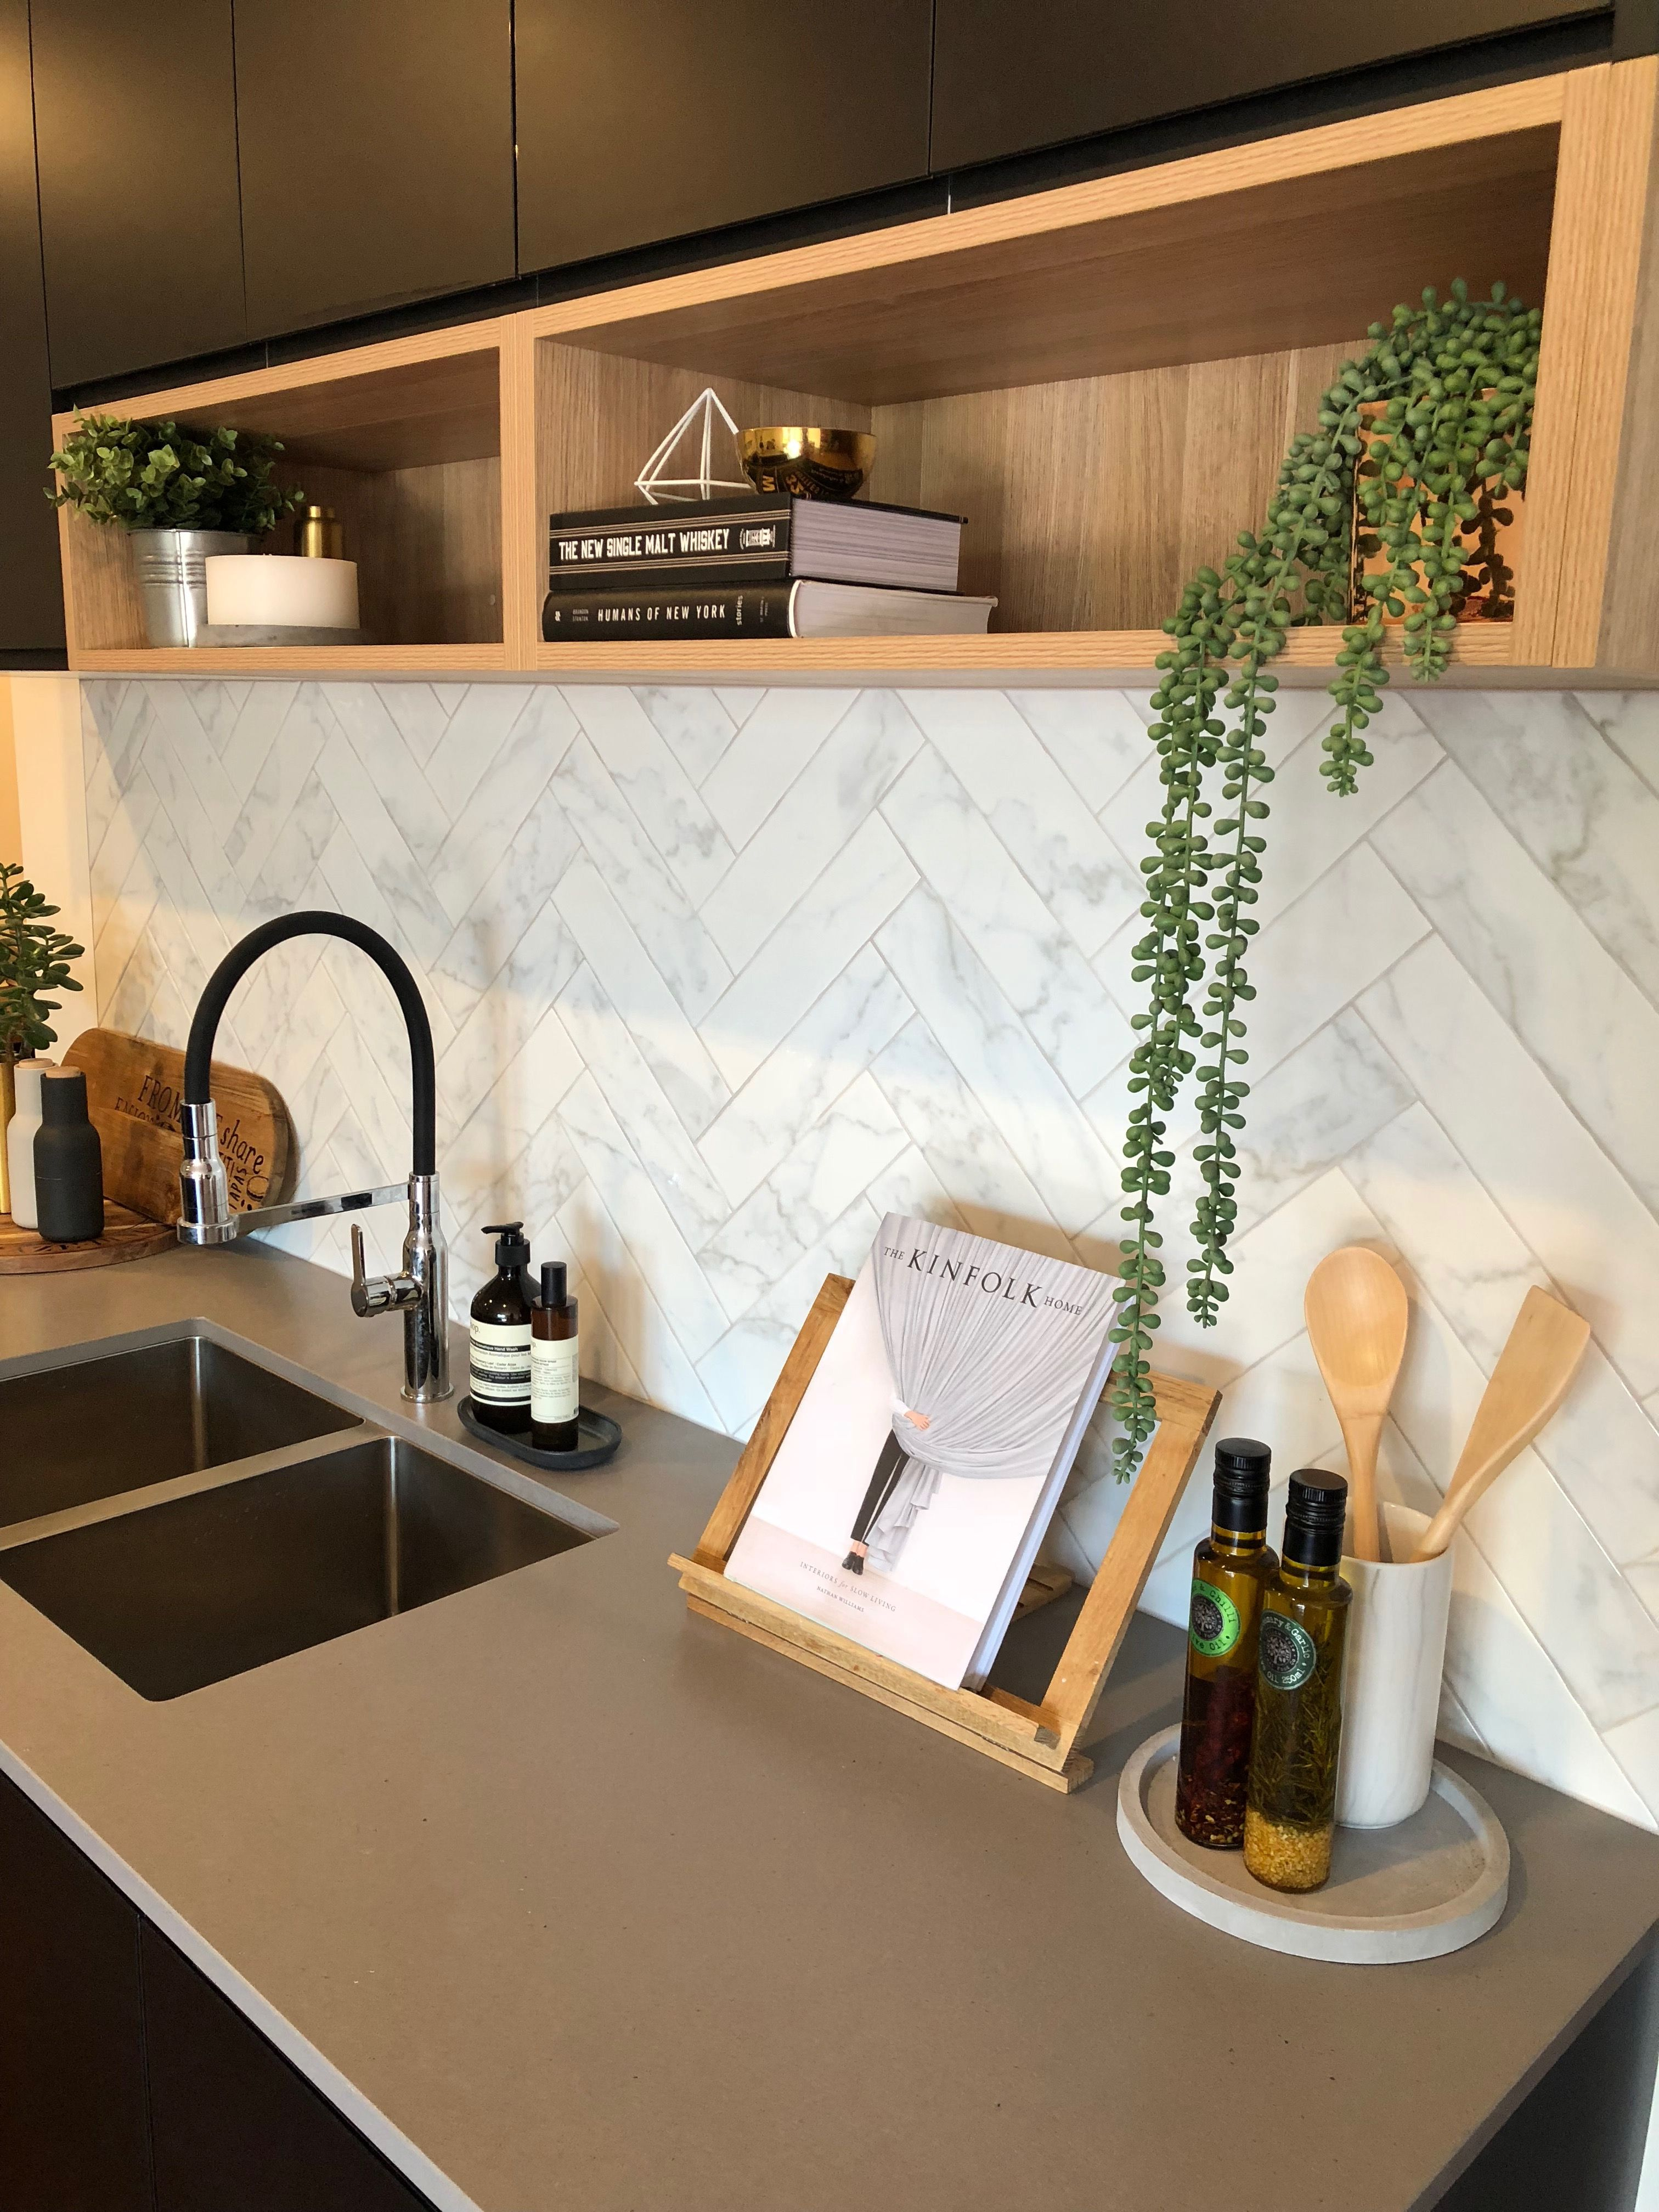 Matt black kitchen with timber shelf detailing, Caesarstone sleek ...